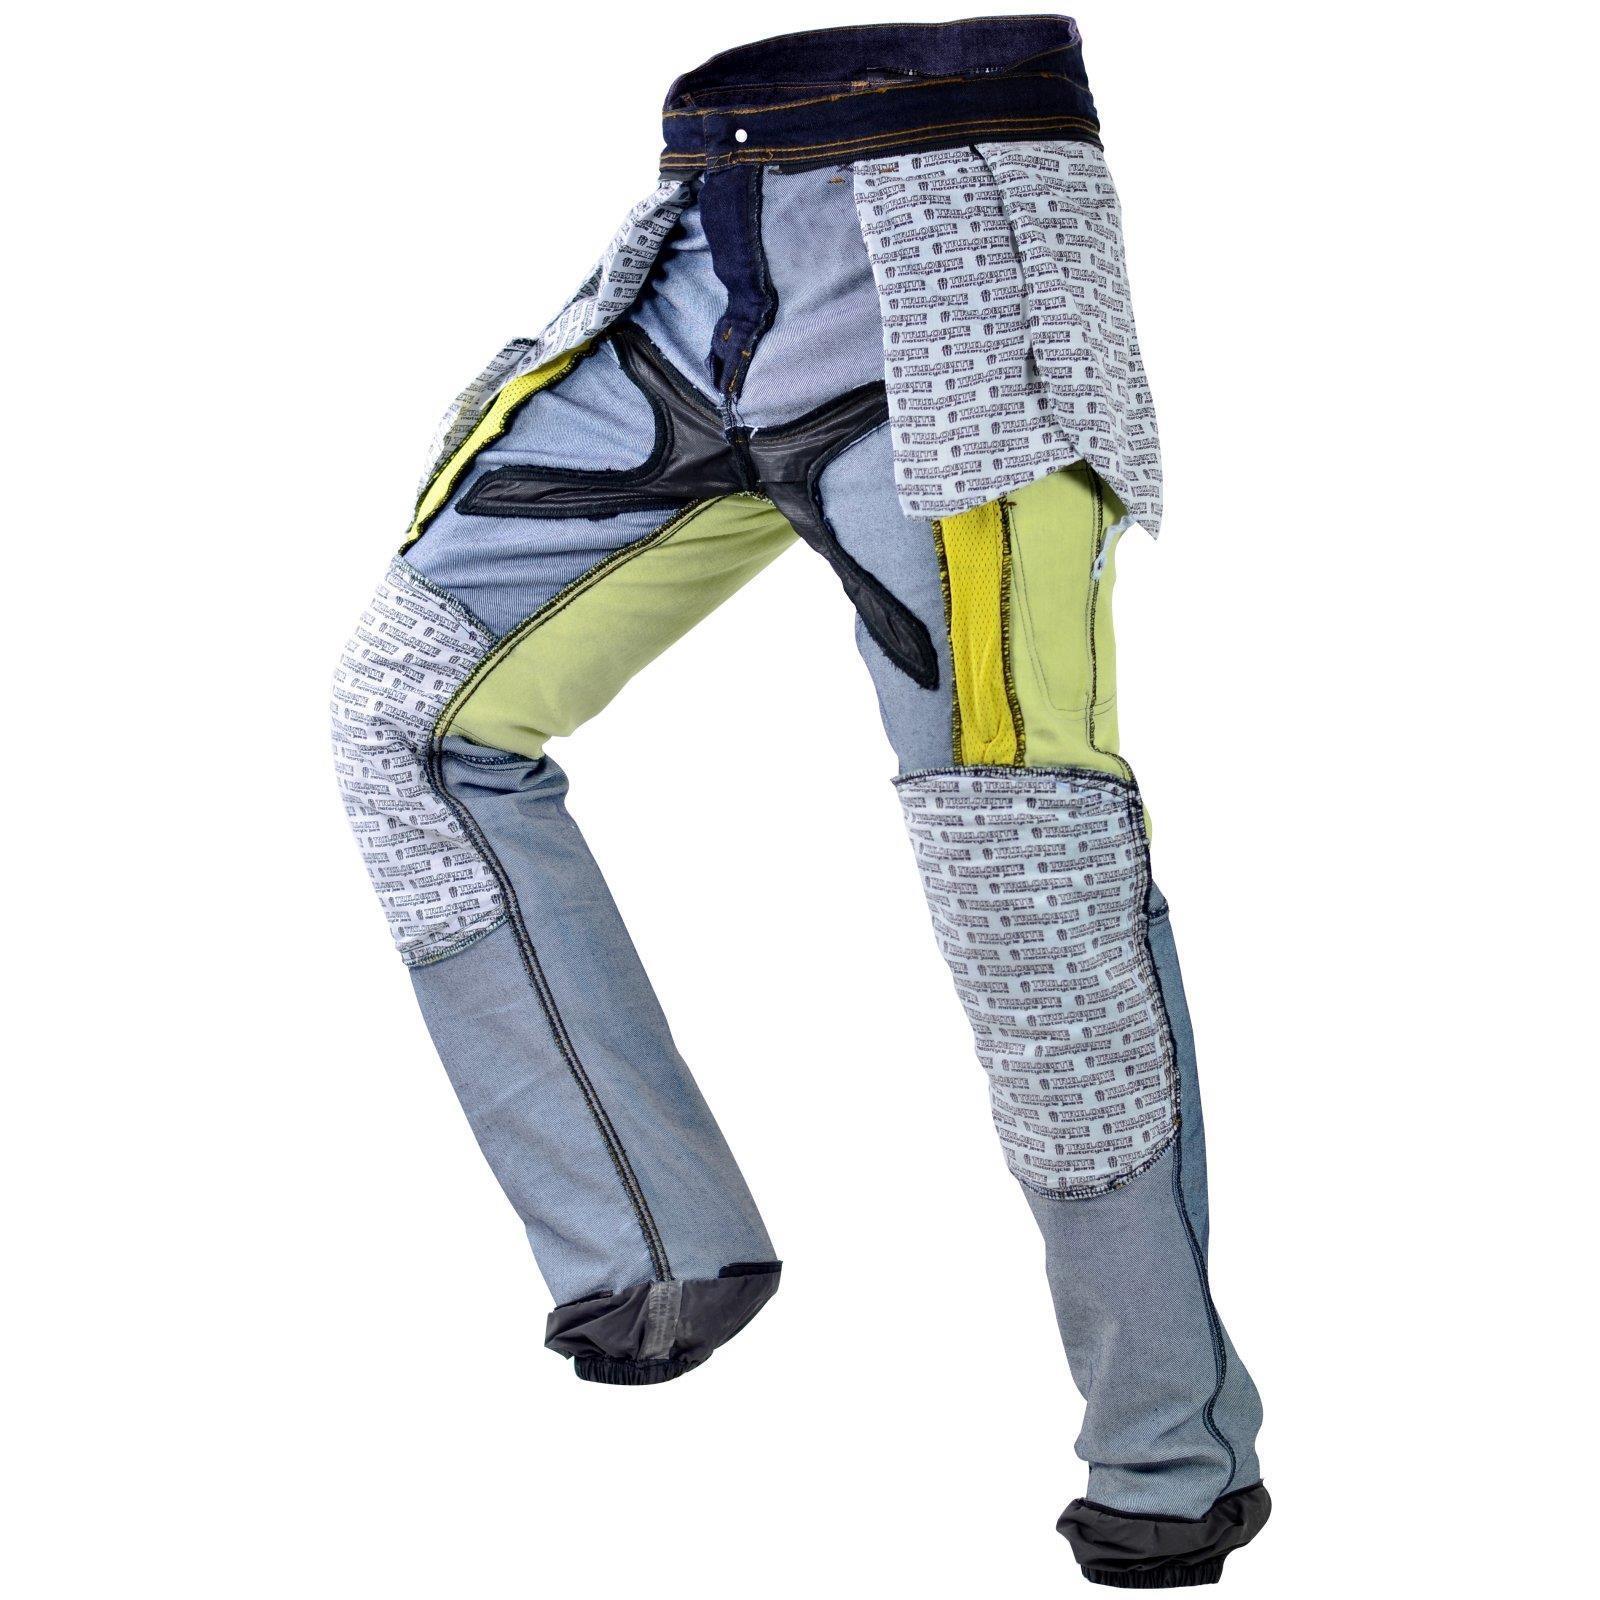 Trilobite-Pantaloni-Moto-Jeans-Abbigliamento-Parado-MICAS-URBAN-DUAL-PANTS-ACID miniatura 27